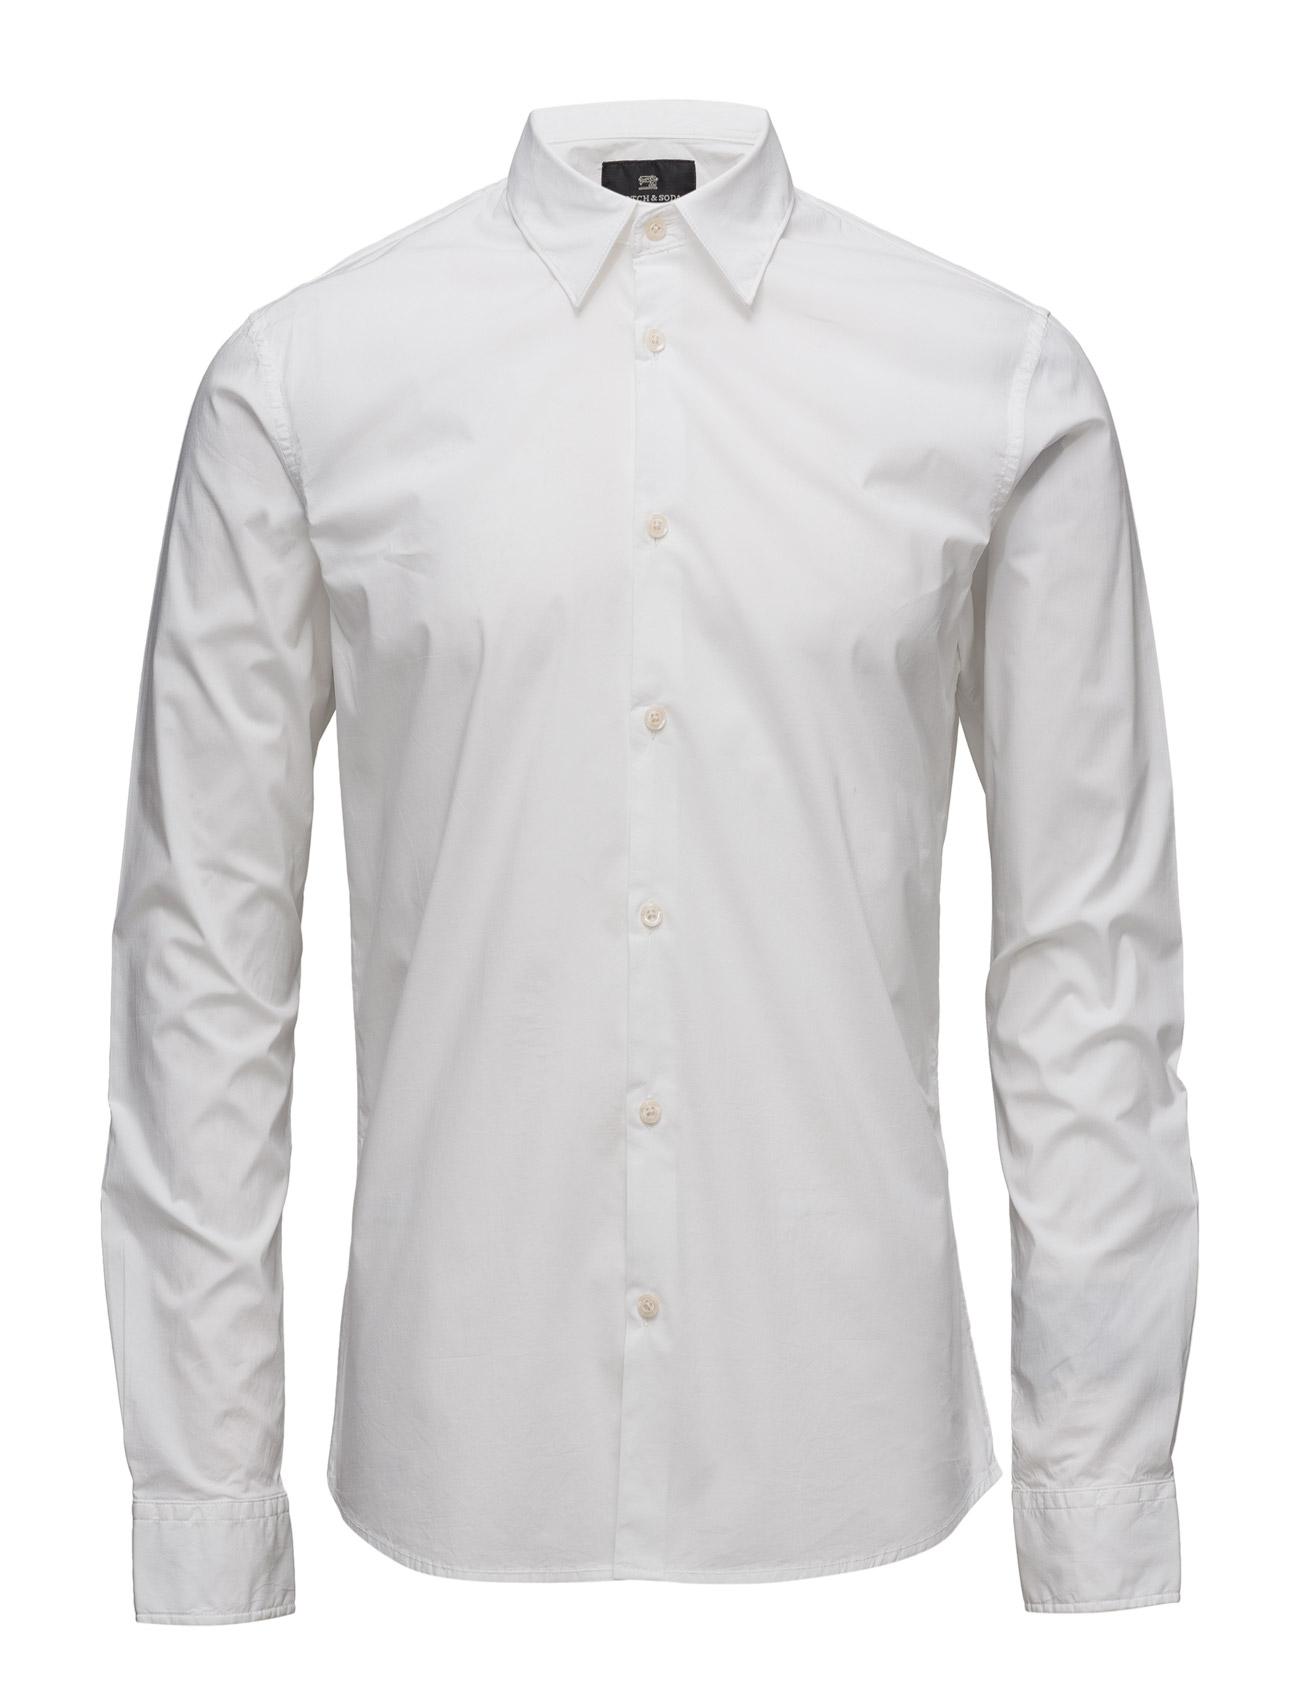 Nos - Classic Longsleeve Shirt Scotch & Soda Business til Mænd i